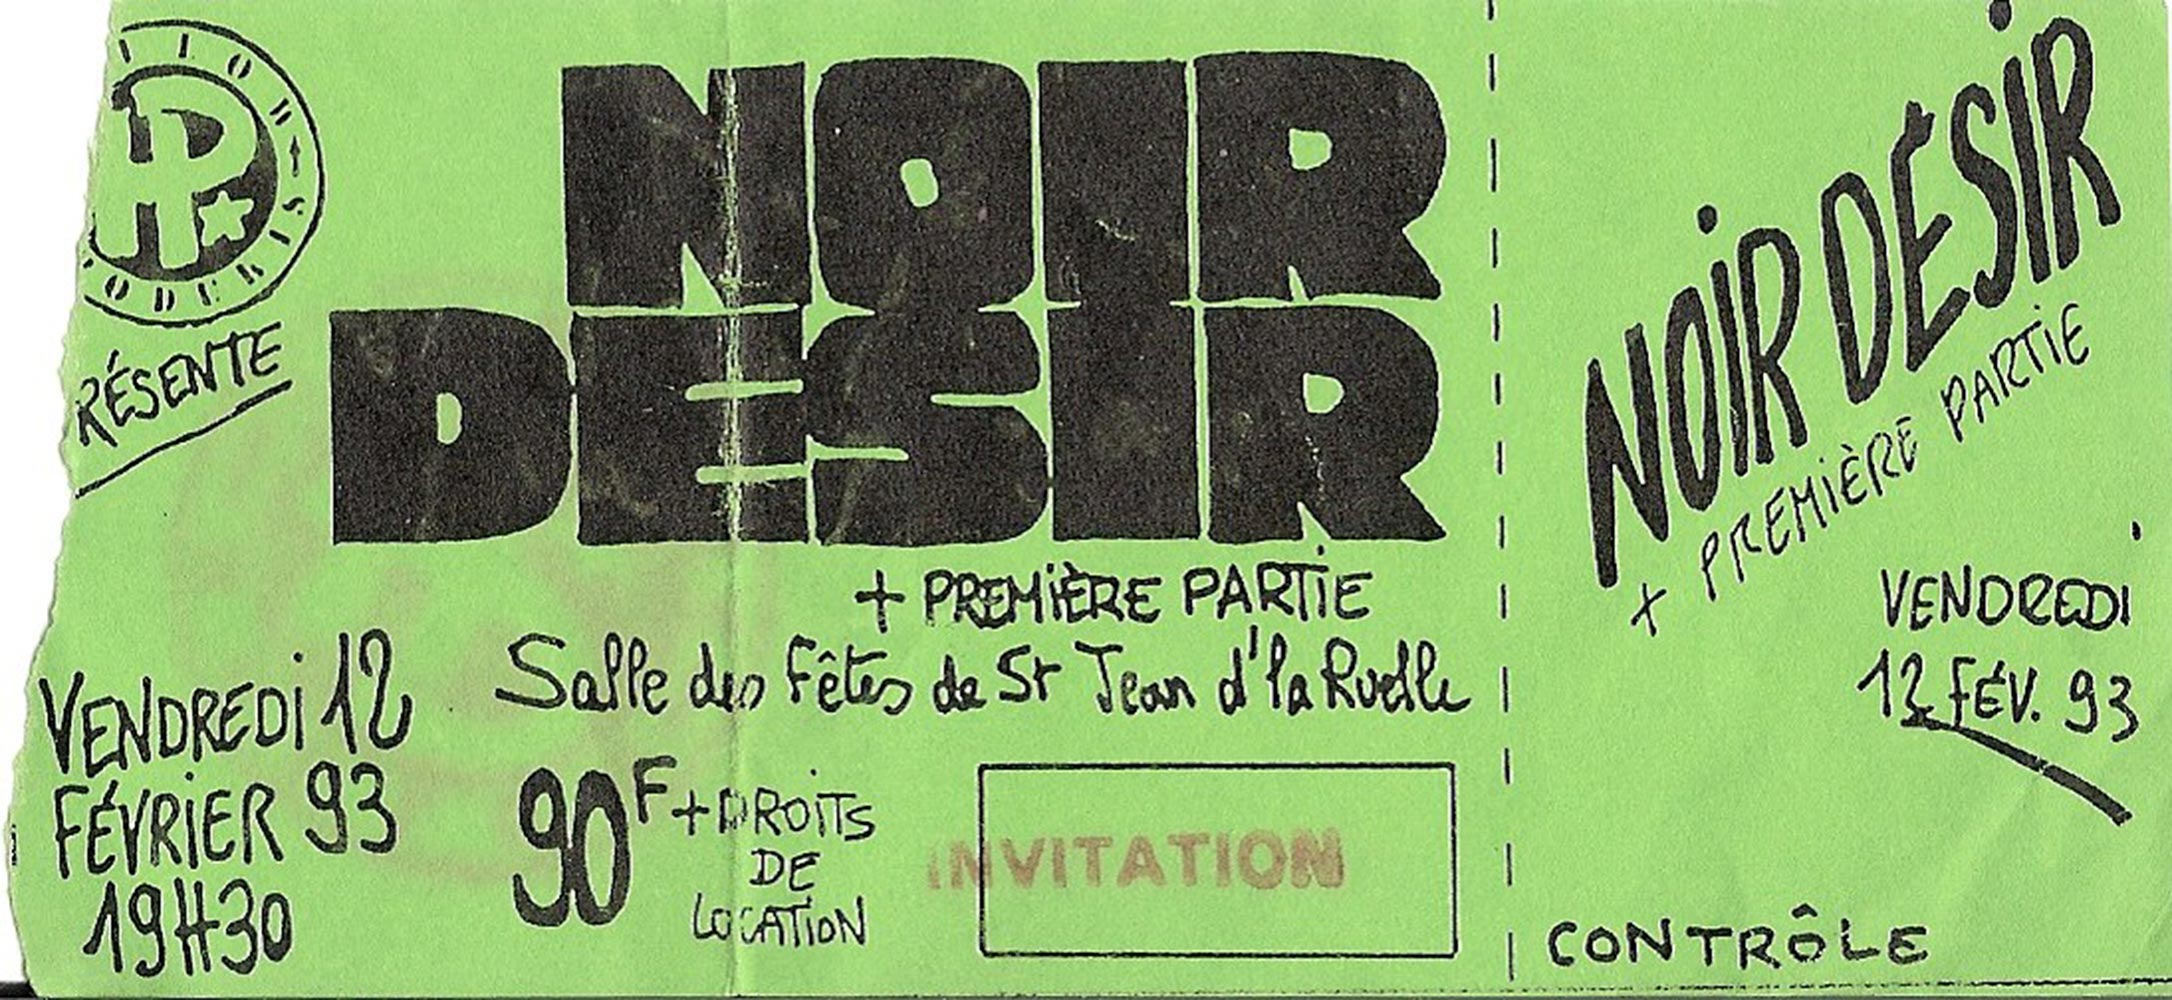 1993_02_12_ticket_invit